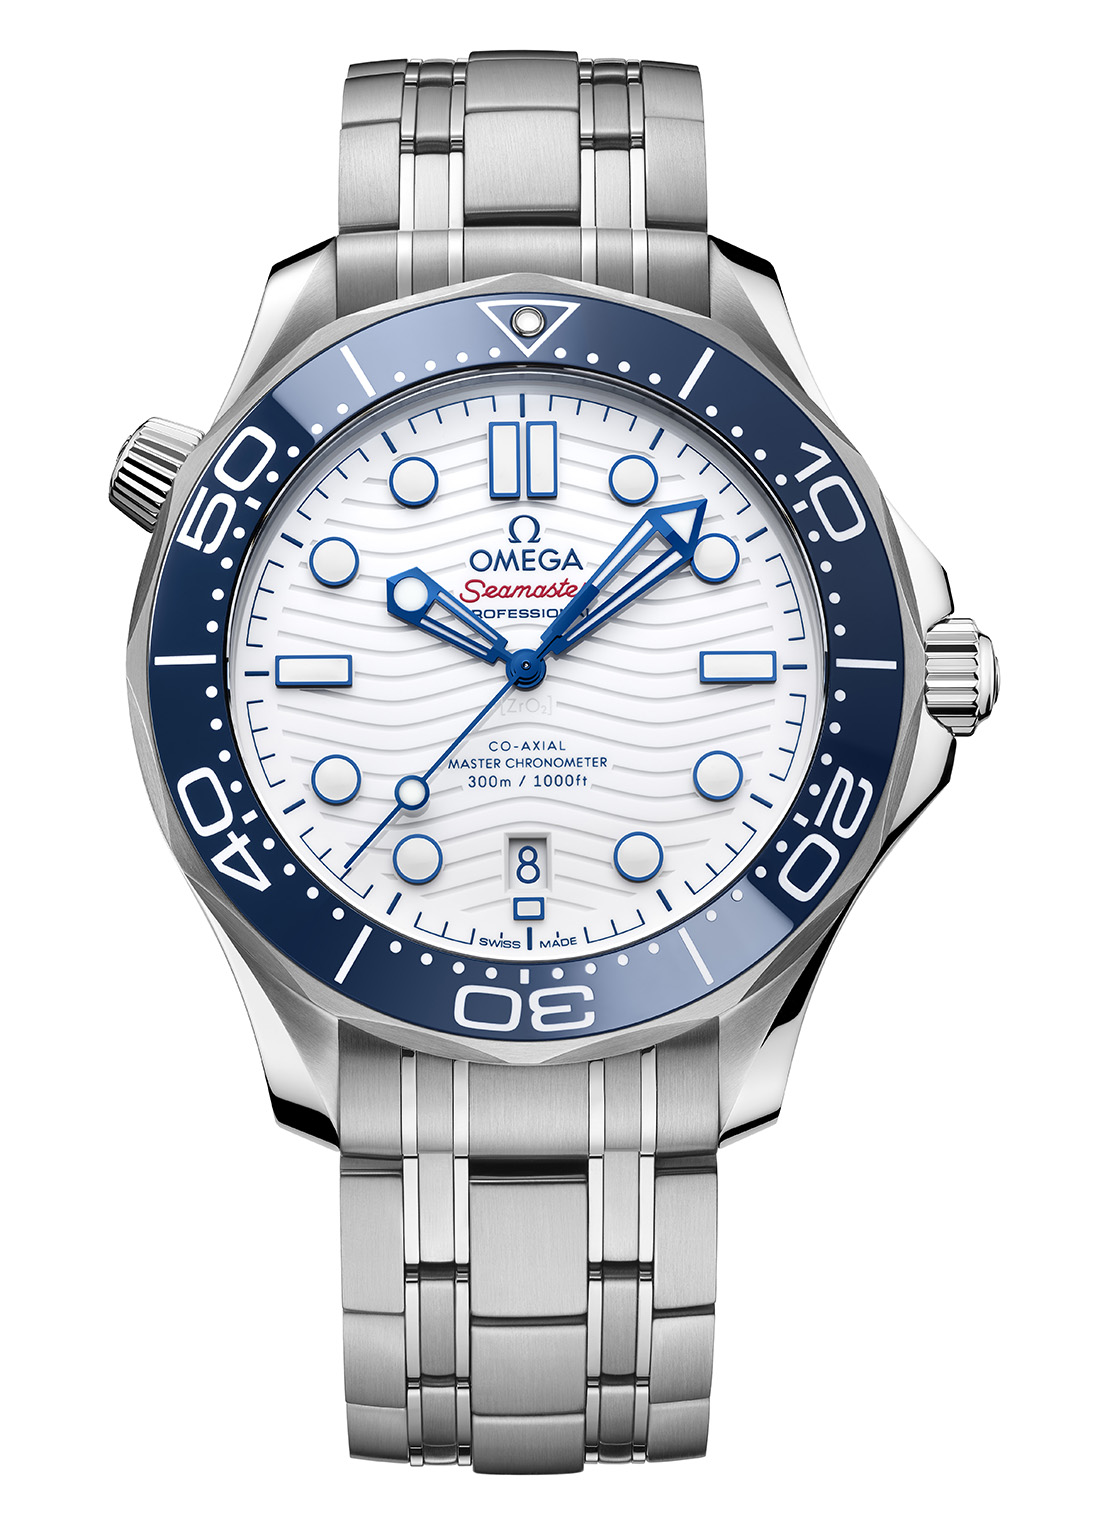 OMEGA Seamaster Diver 300 Edition Tokyo 2020